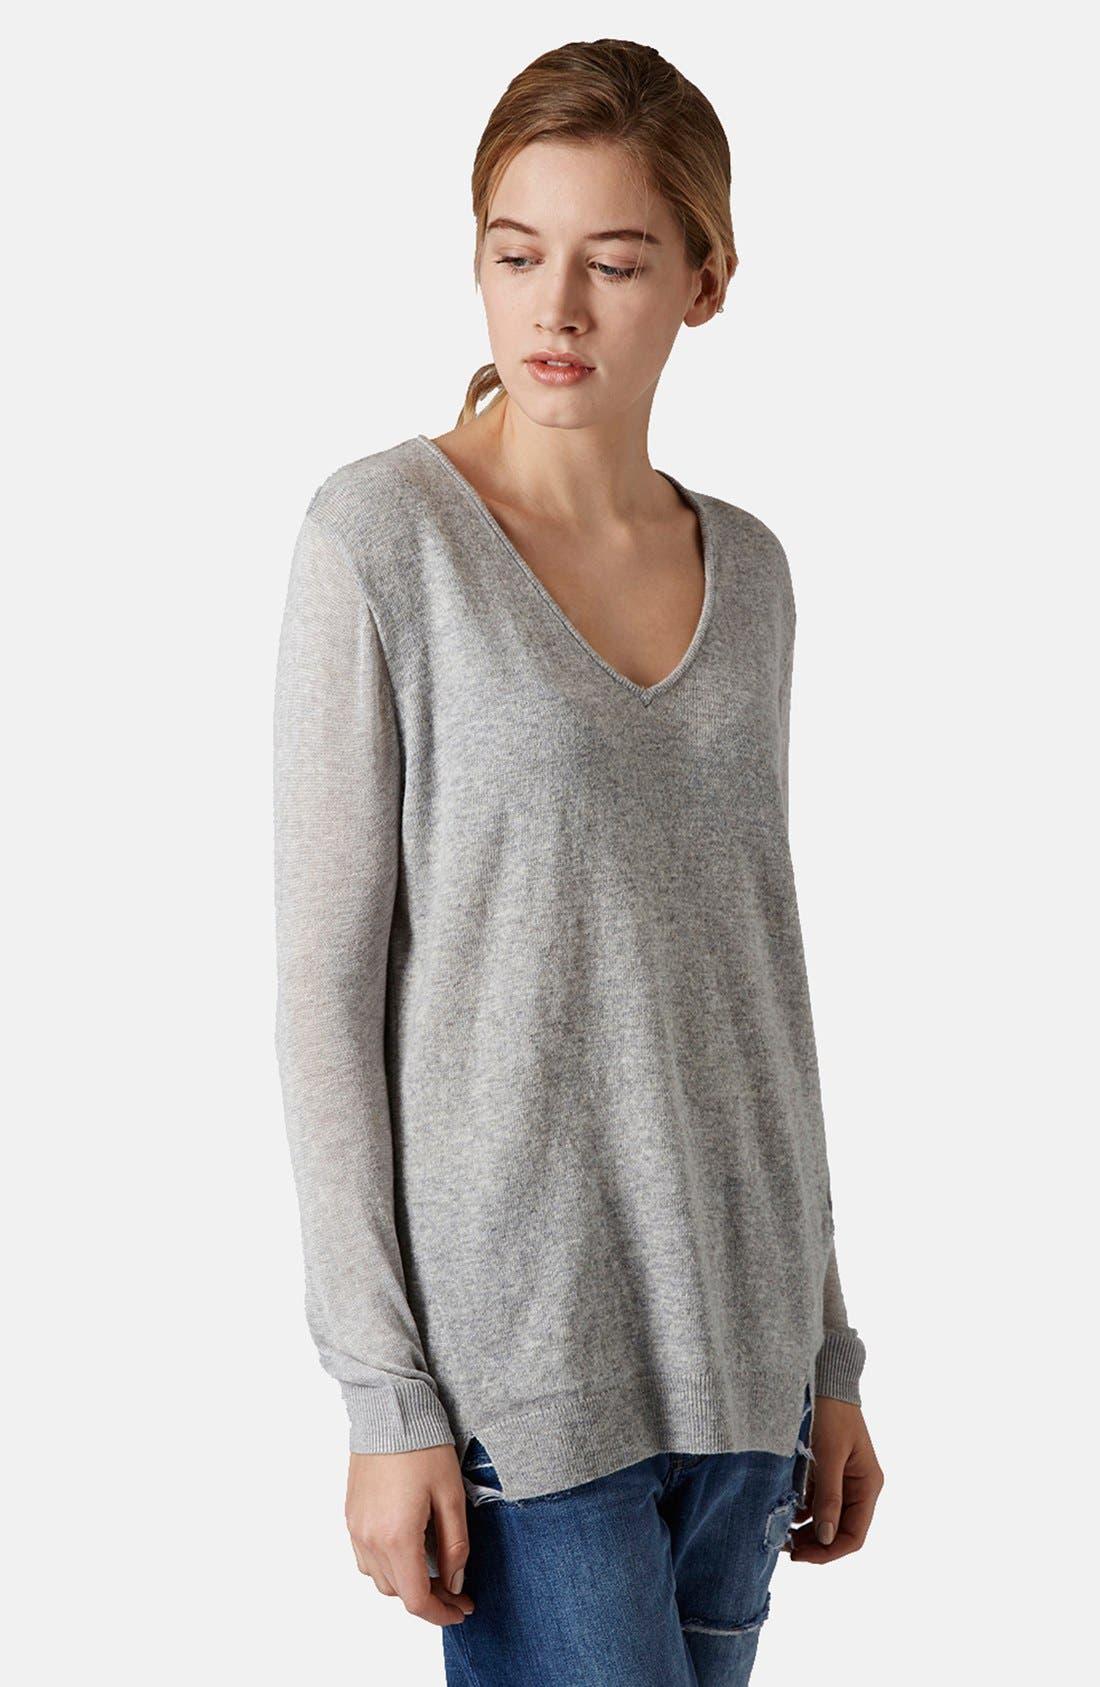 TOPSHOP, Sheer Sleeve Tunic Sweater, Main thumbnail 1, color, 050